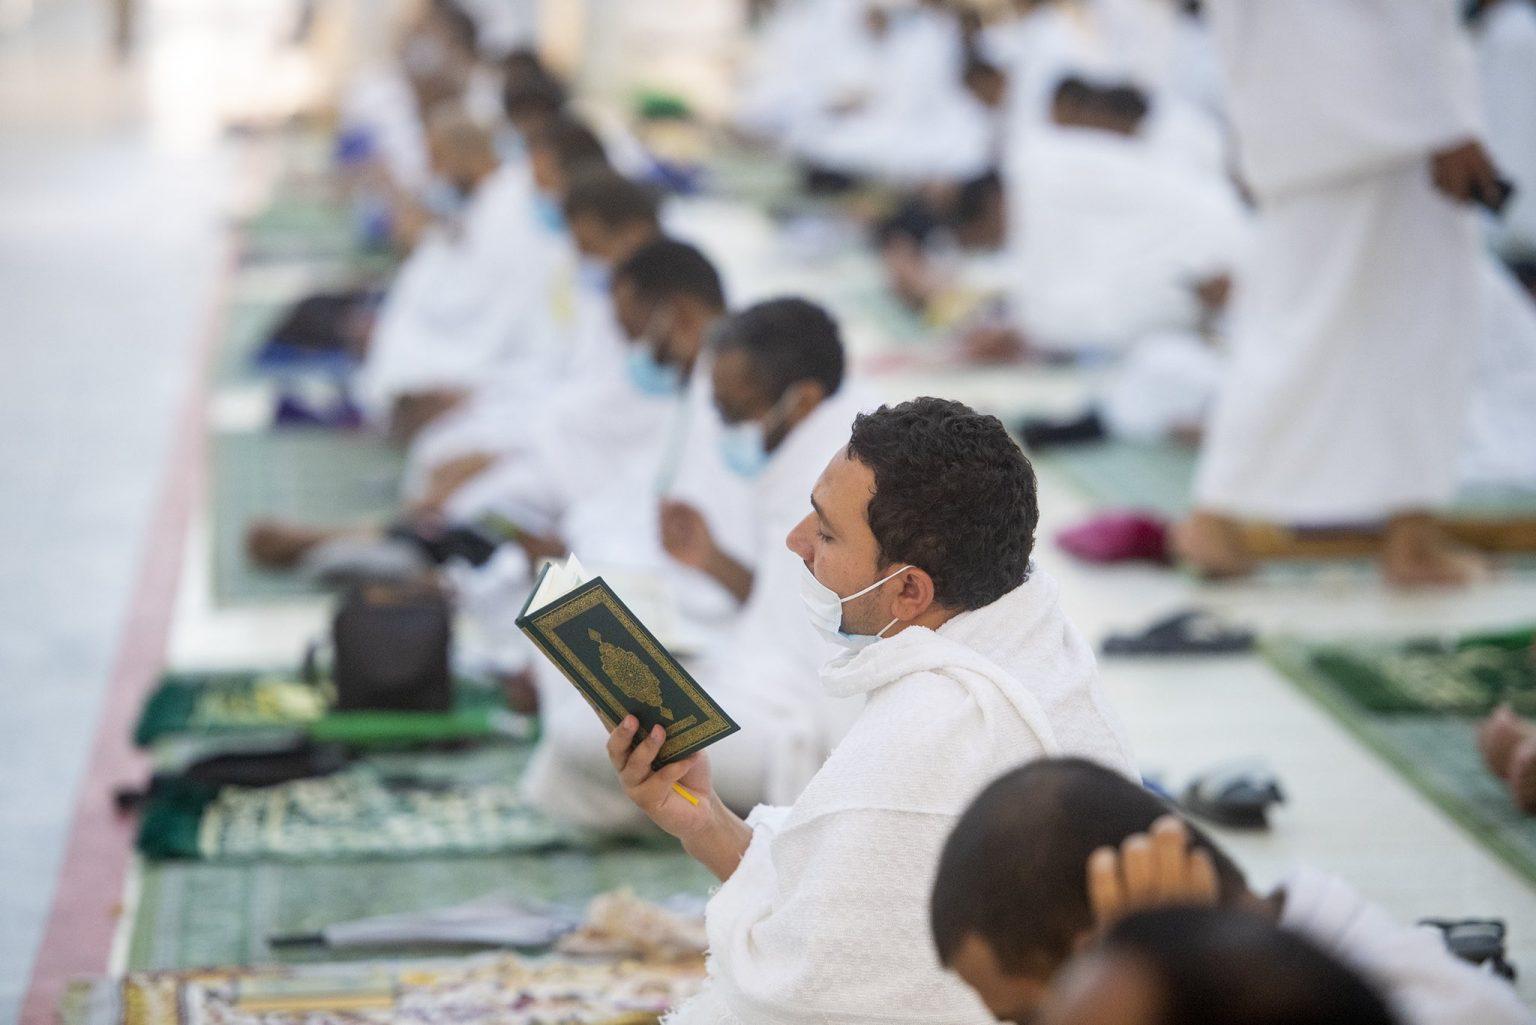 E6pfkmcXsAIcTYf 1536x1025 1 - شاهد الحجاج يتوجهون إلى مسجد نمرة لتأدية صلاتي الظهر والعصر جمعًا